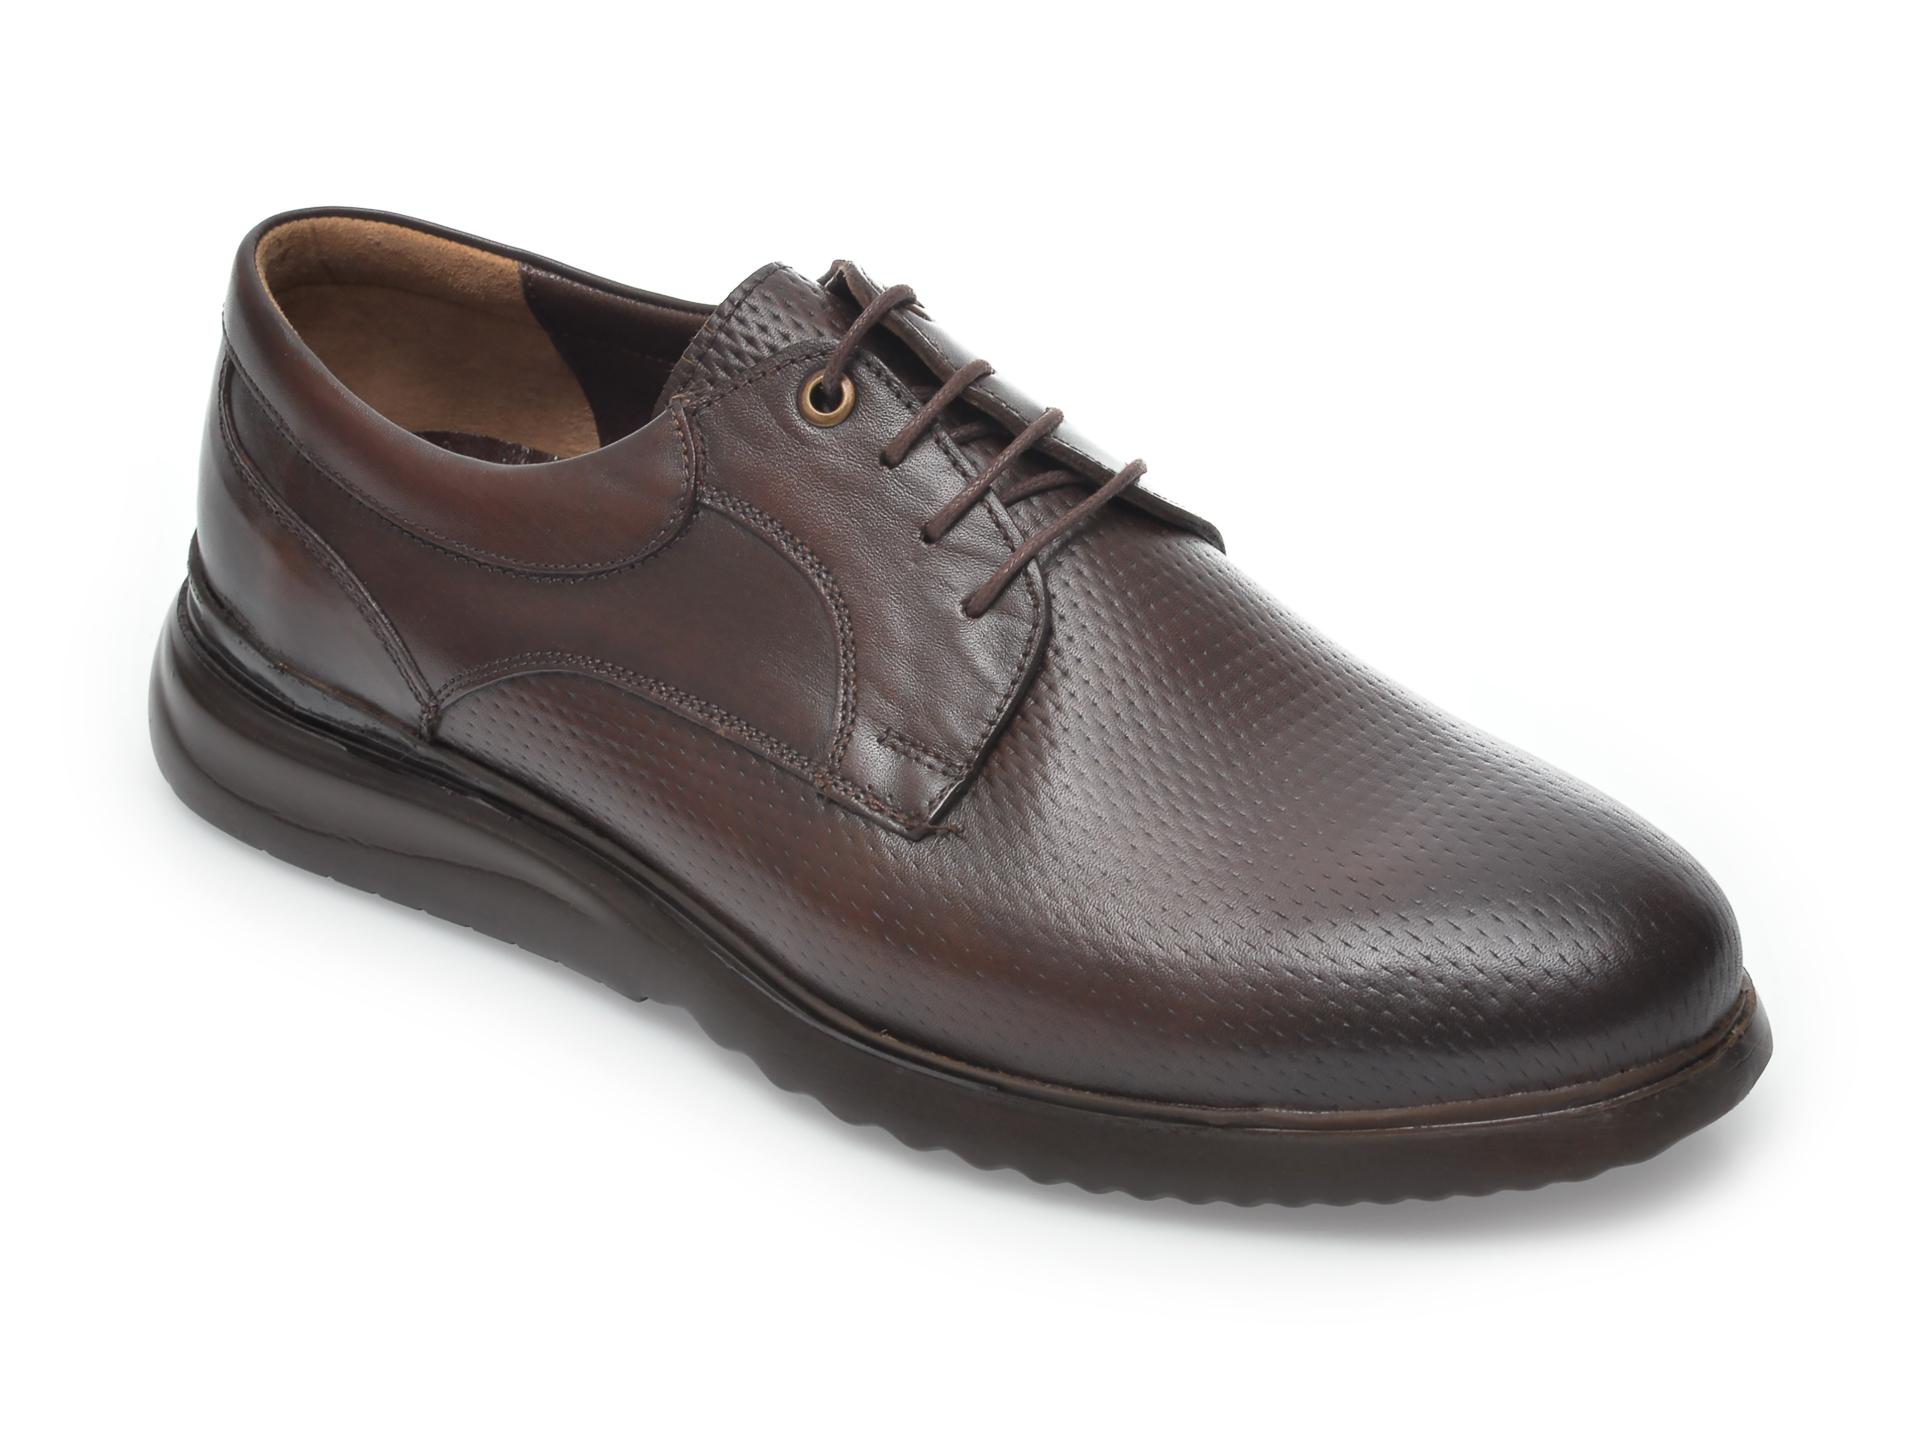 Pantofi OTTER maro, 10191, din piele naturala New